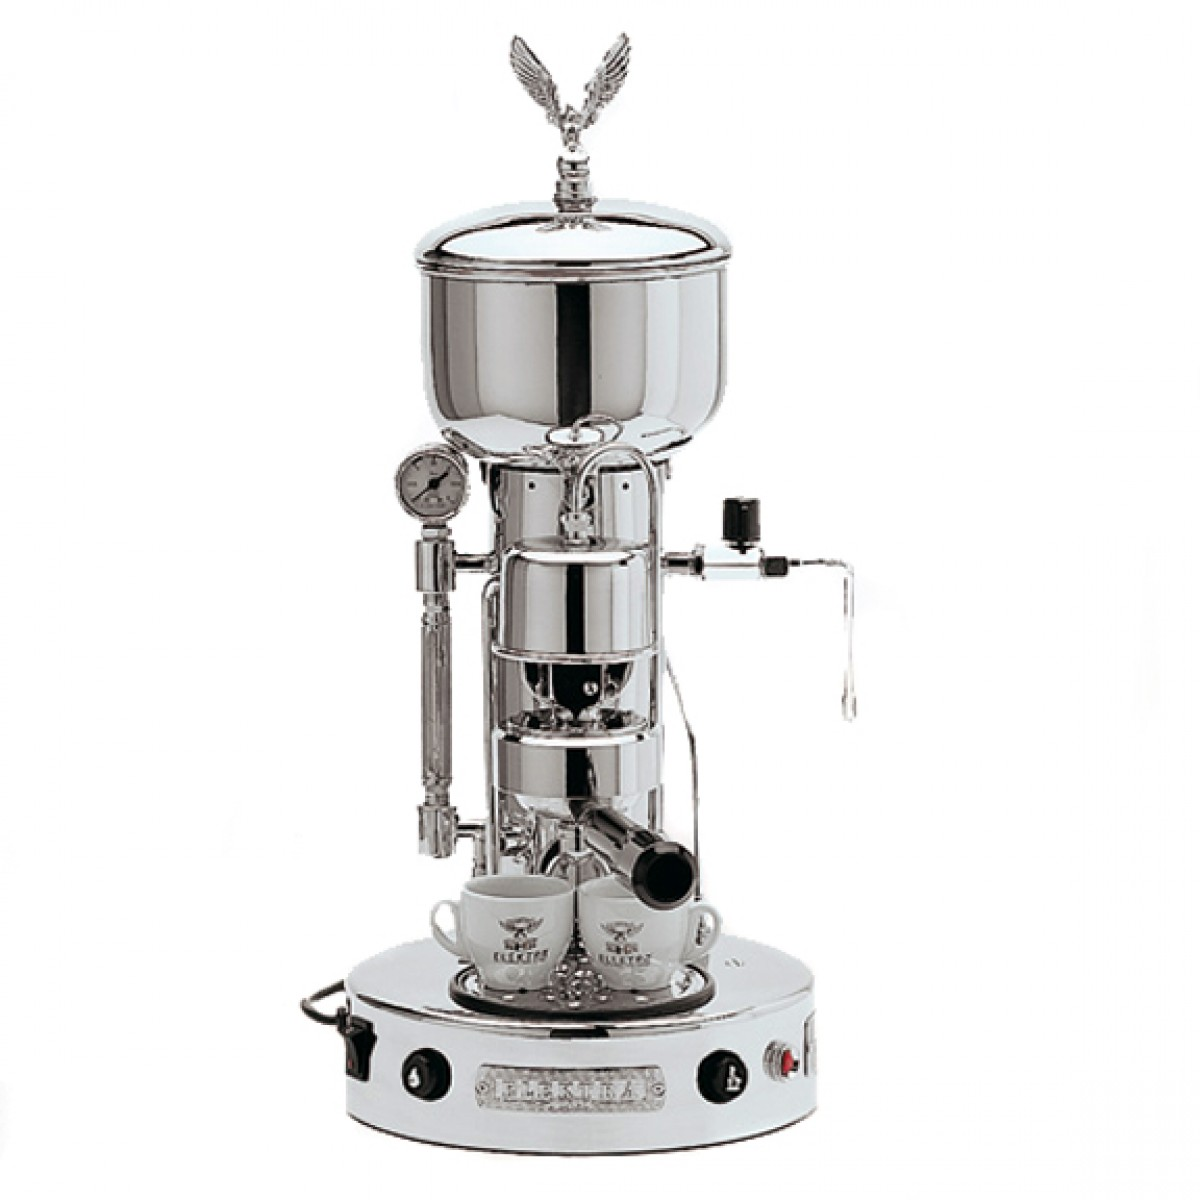 Elektra ART.SX Microcasa Semiautomatic Espresso Machine Review